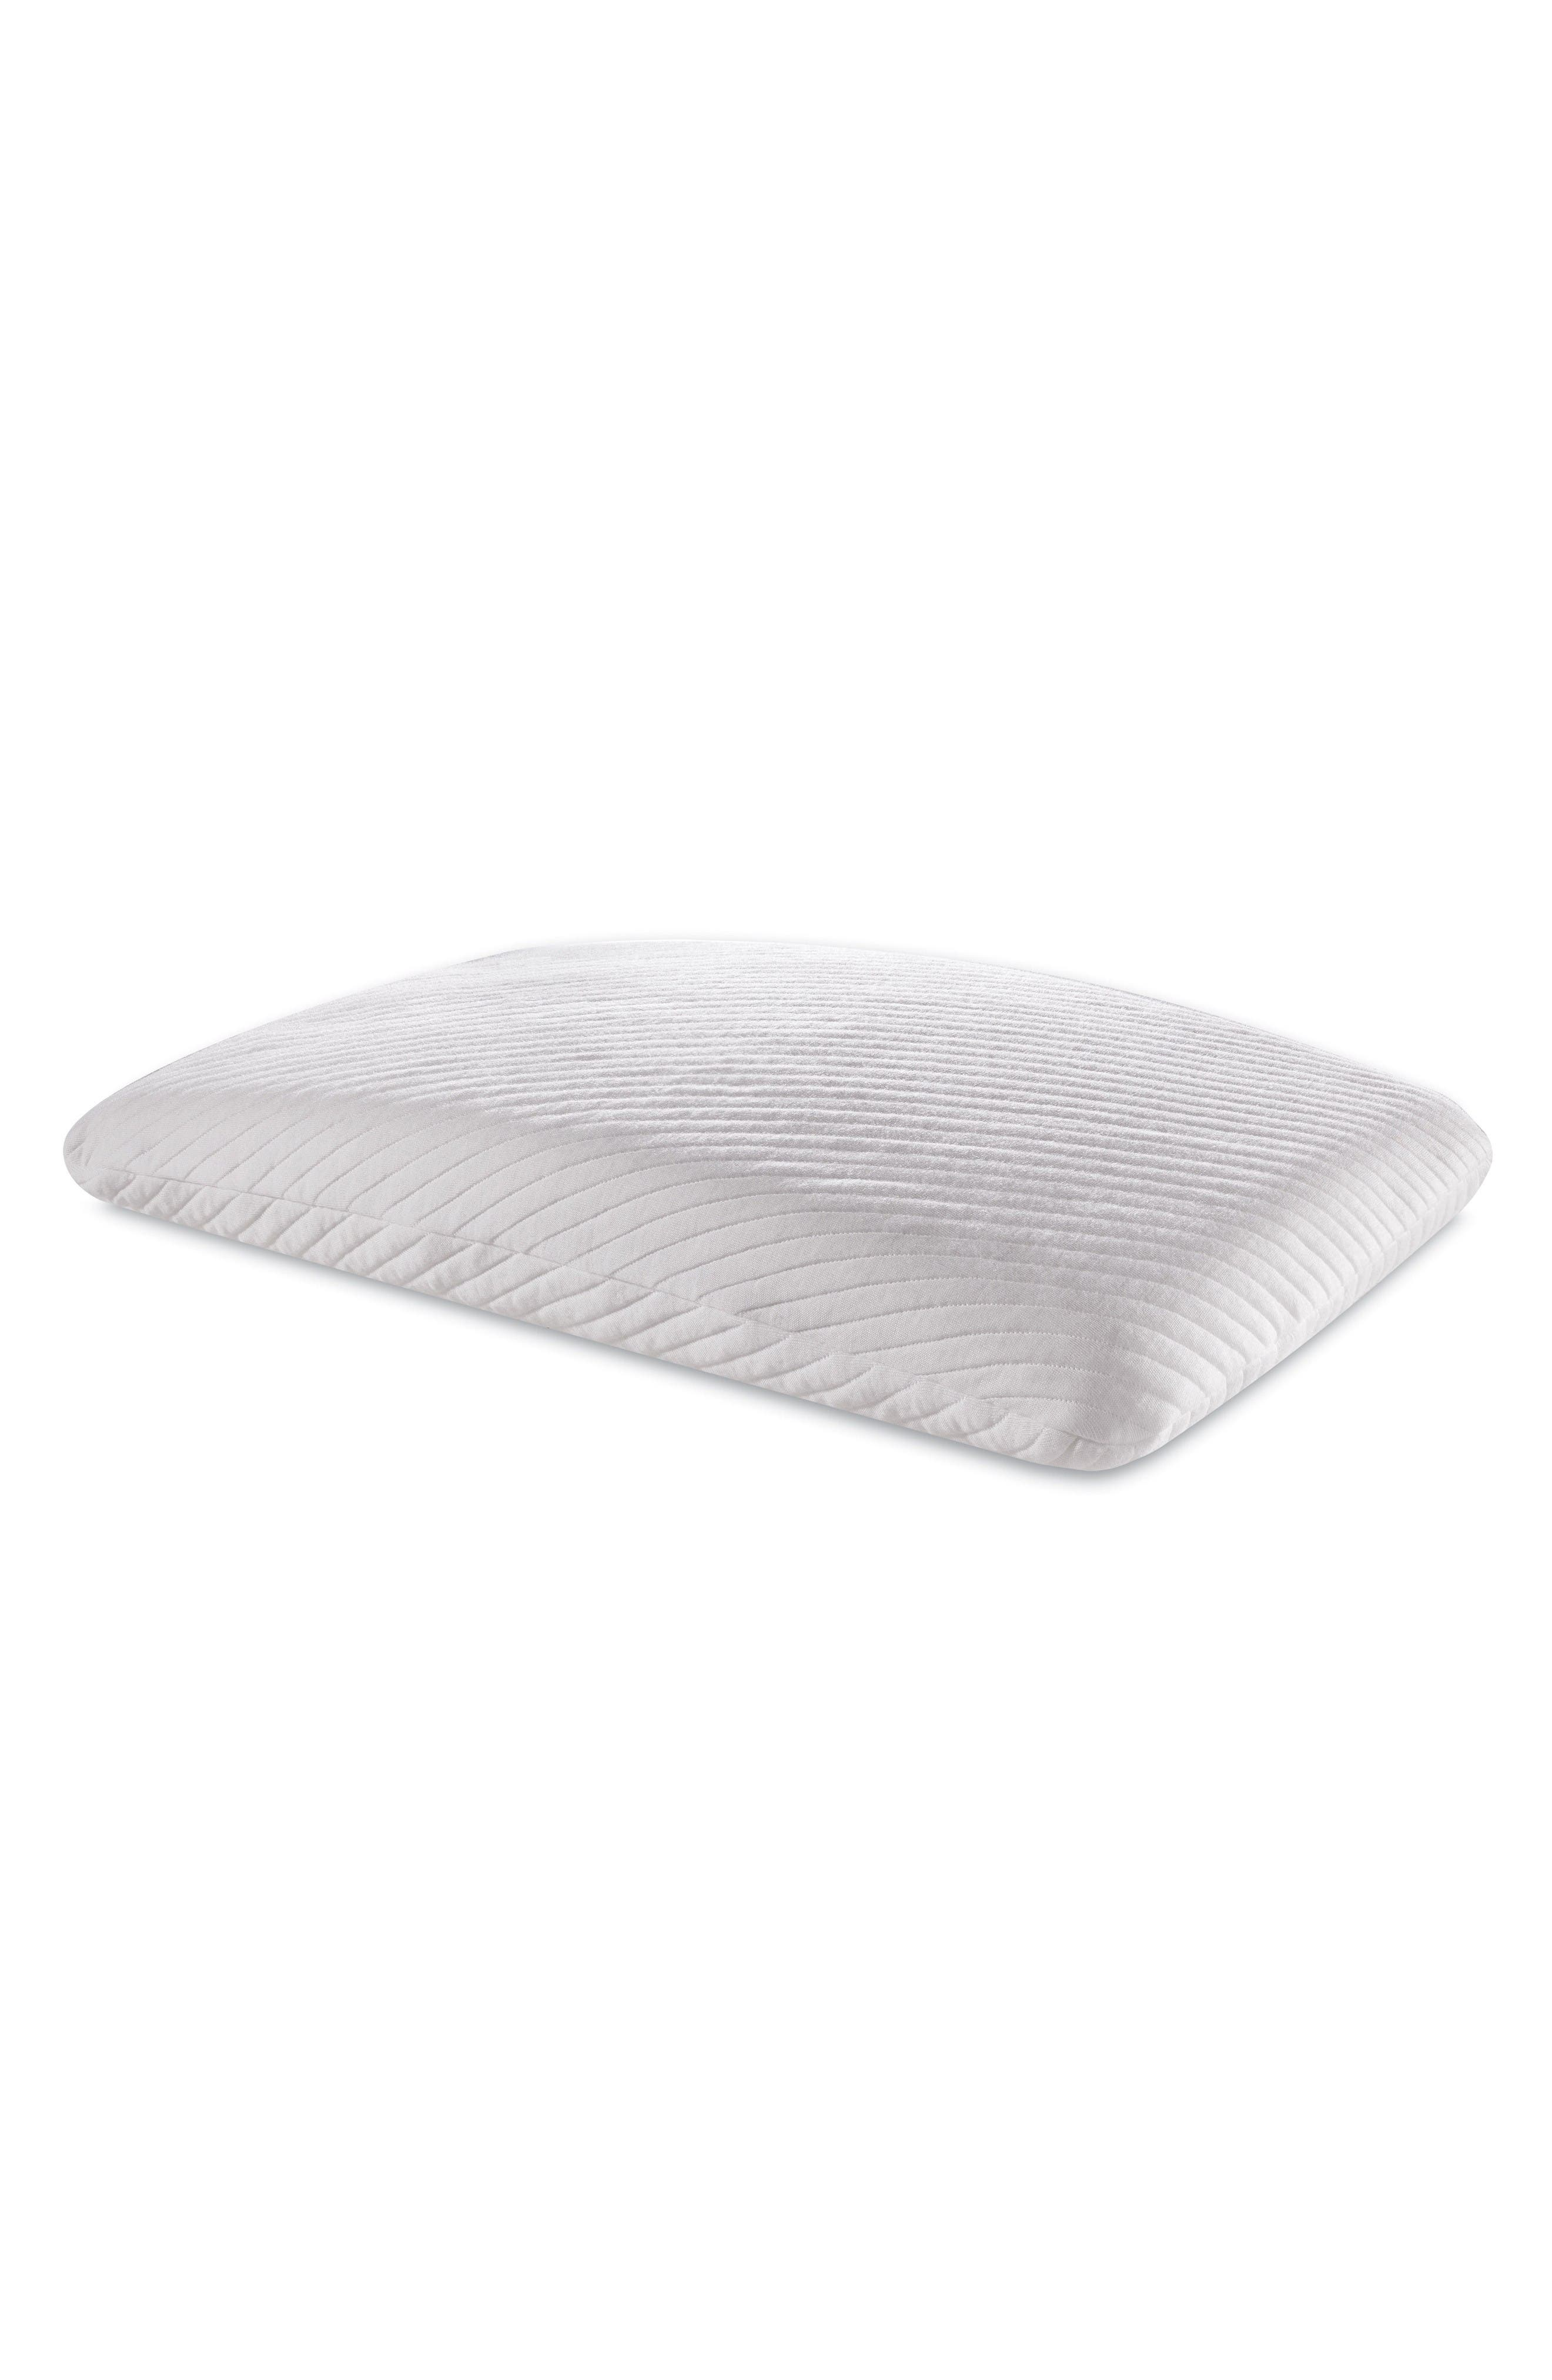 Tempur-Pedic TEMPUR-Essential Support Pillow